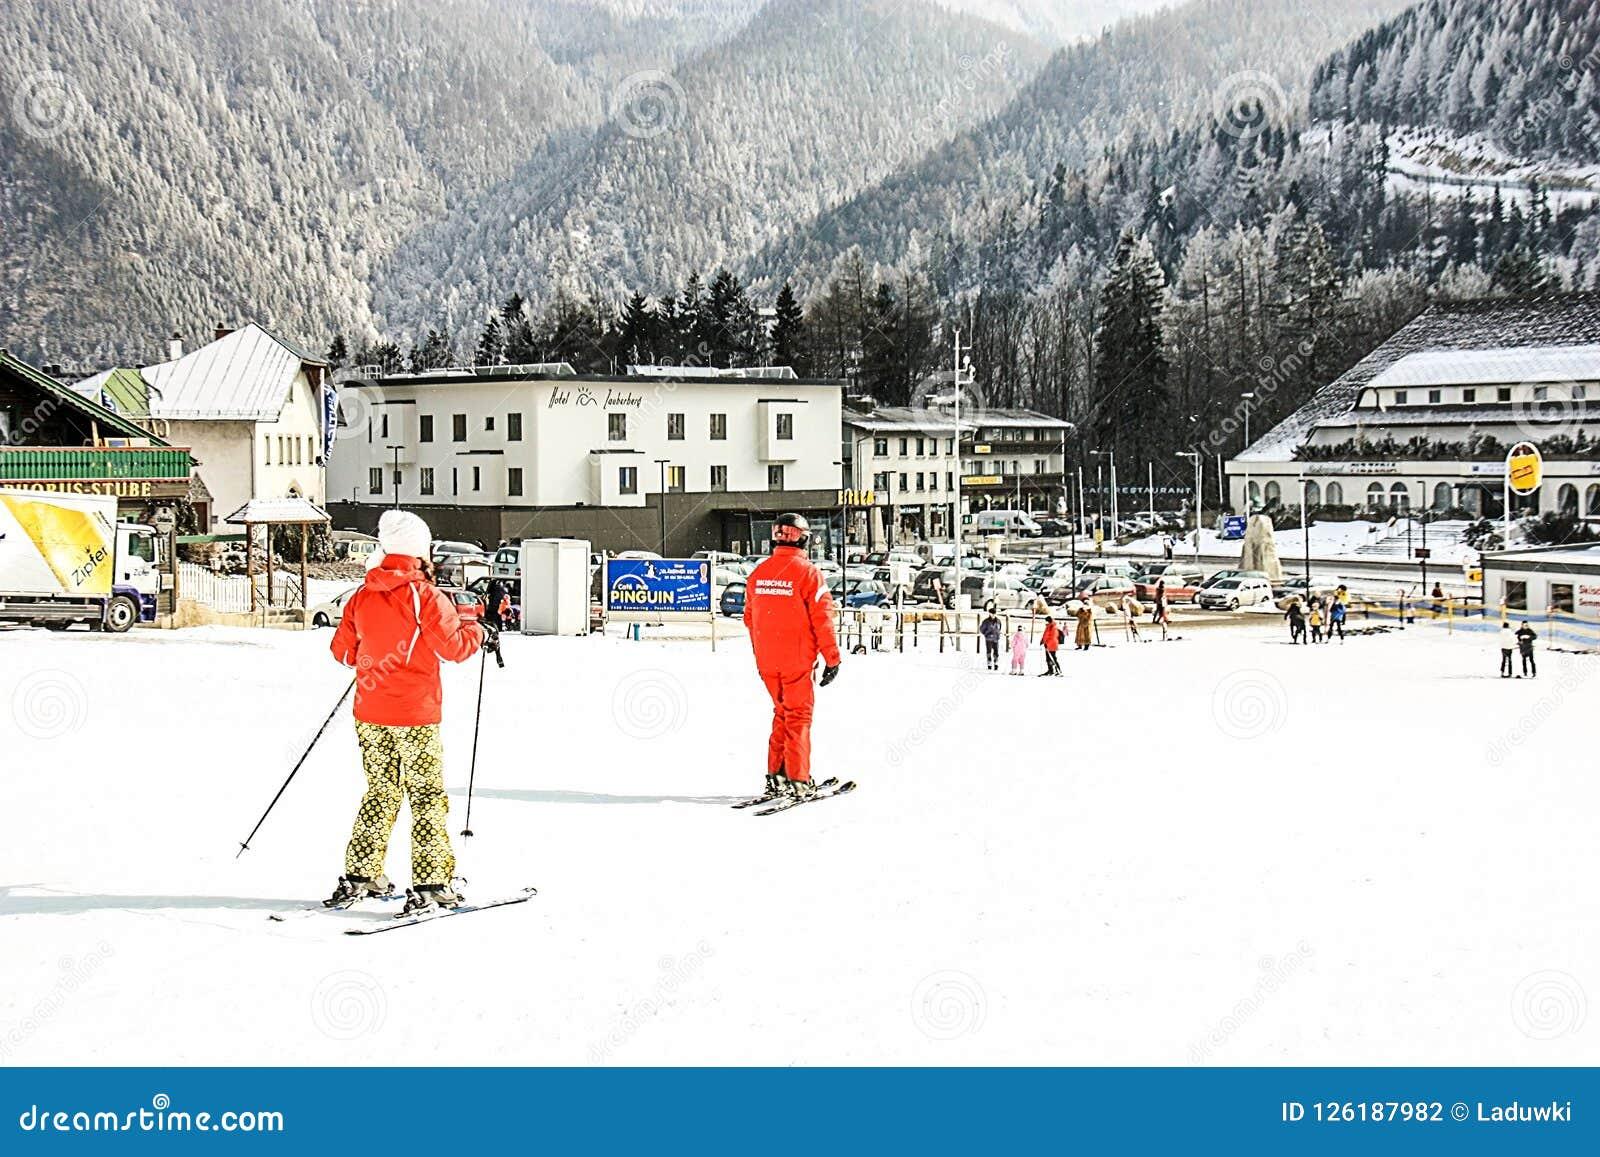 Alpine ski school. Instructor and student in colorful ski equipment